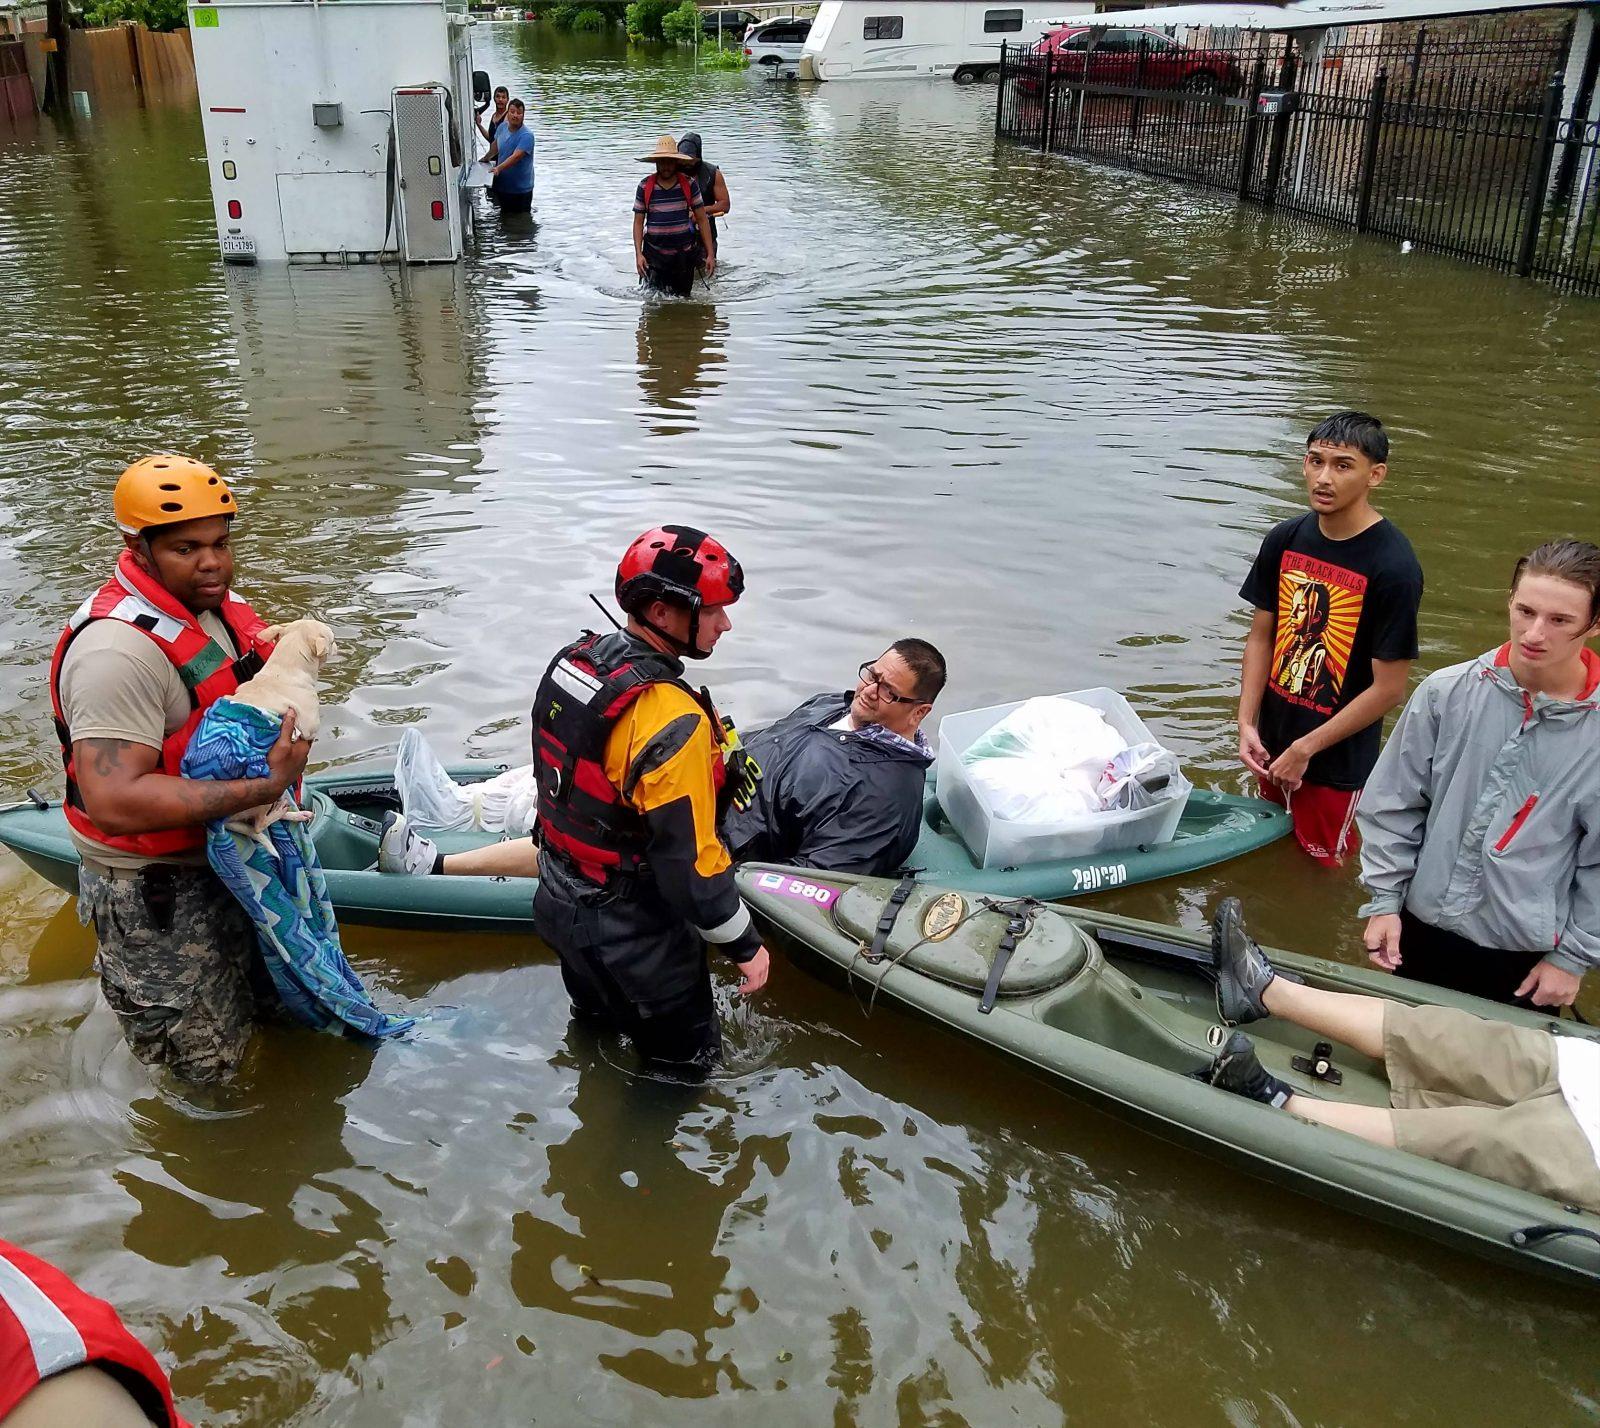 Climate change: The future humanitarian crisis